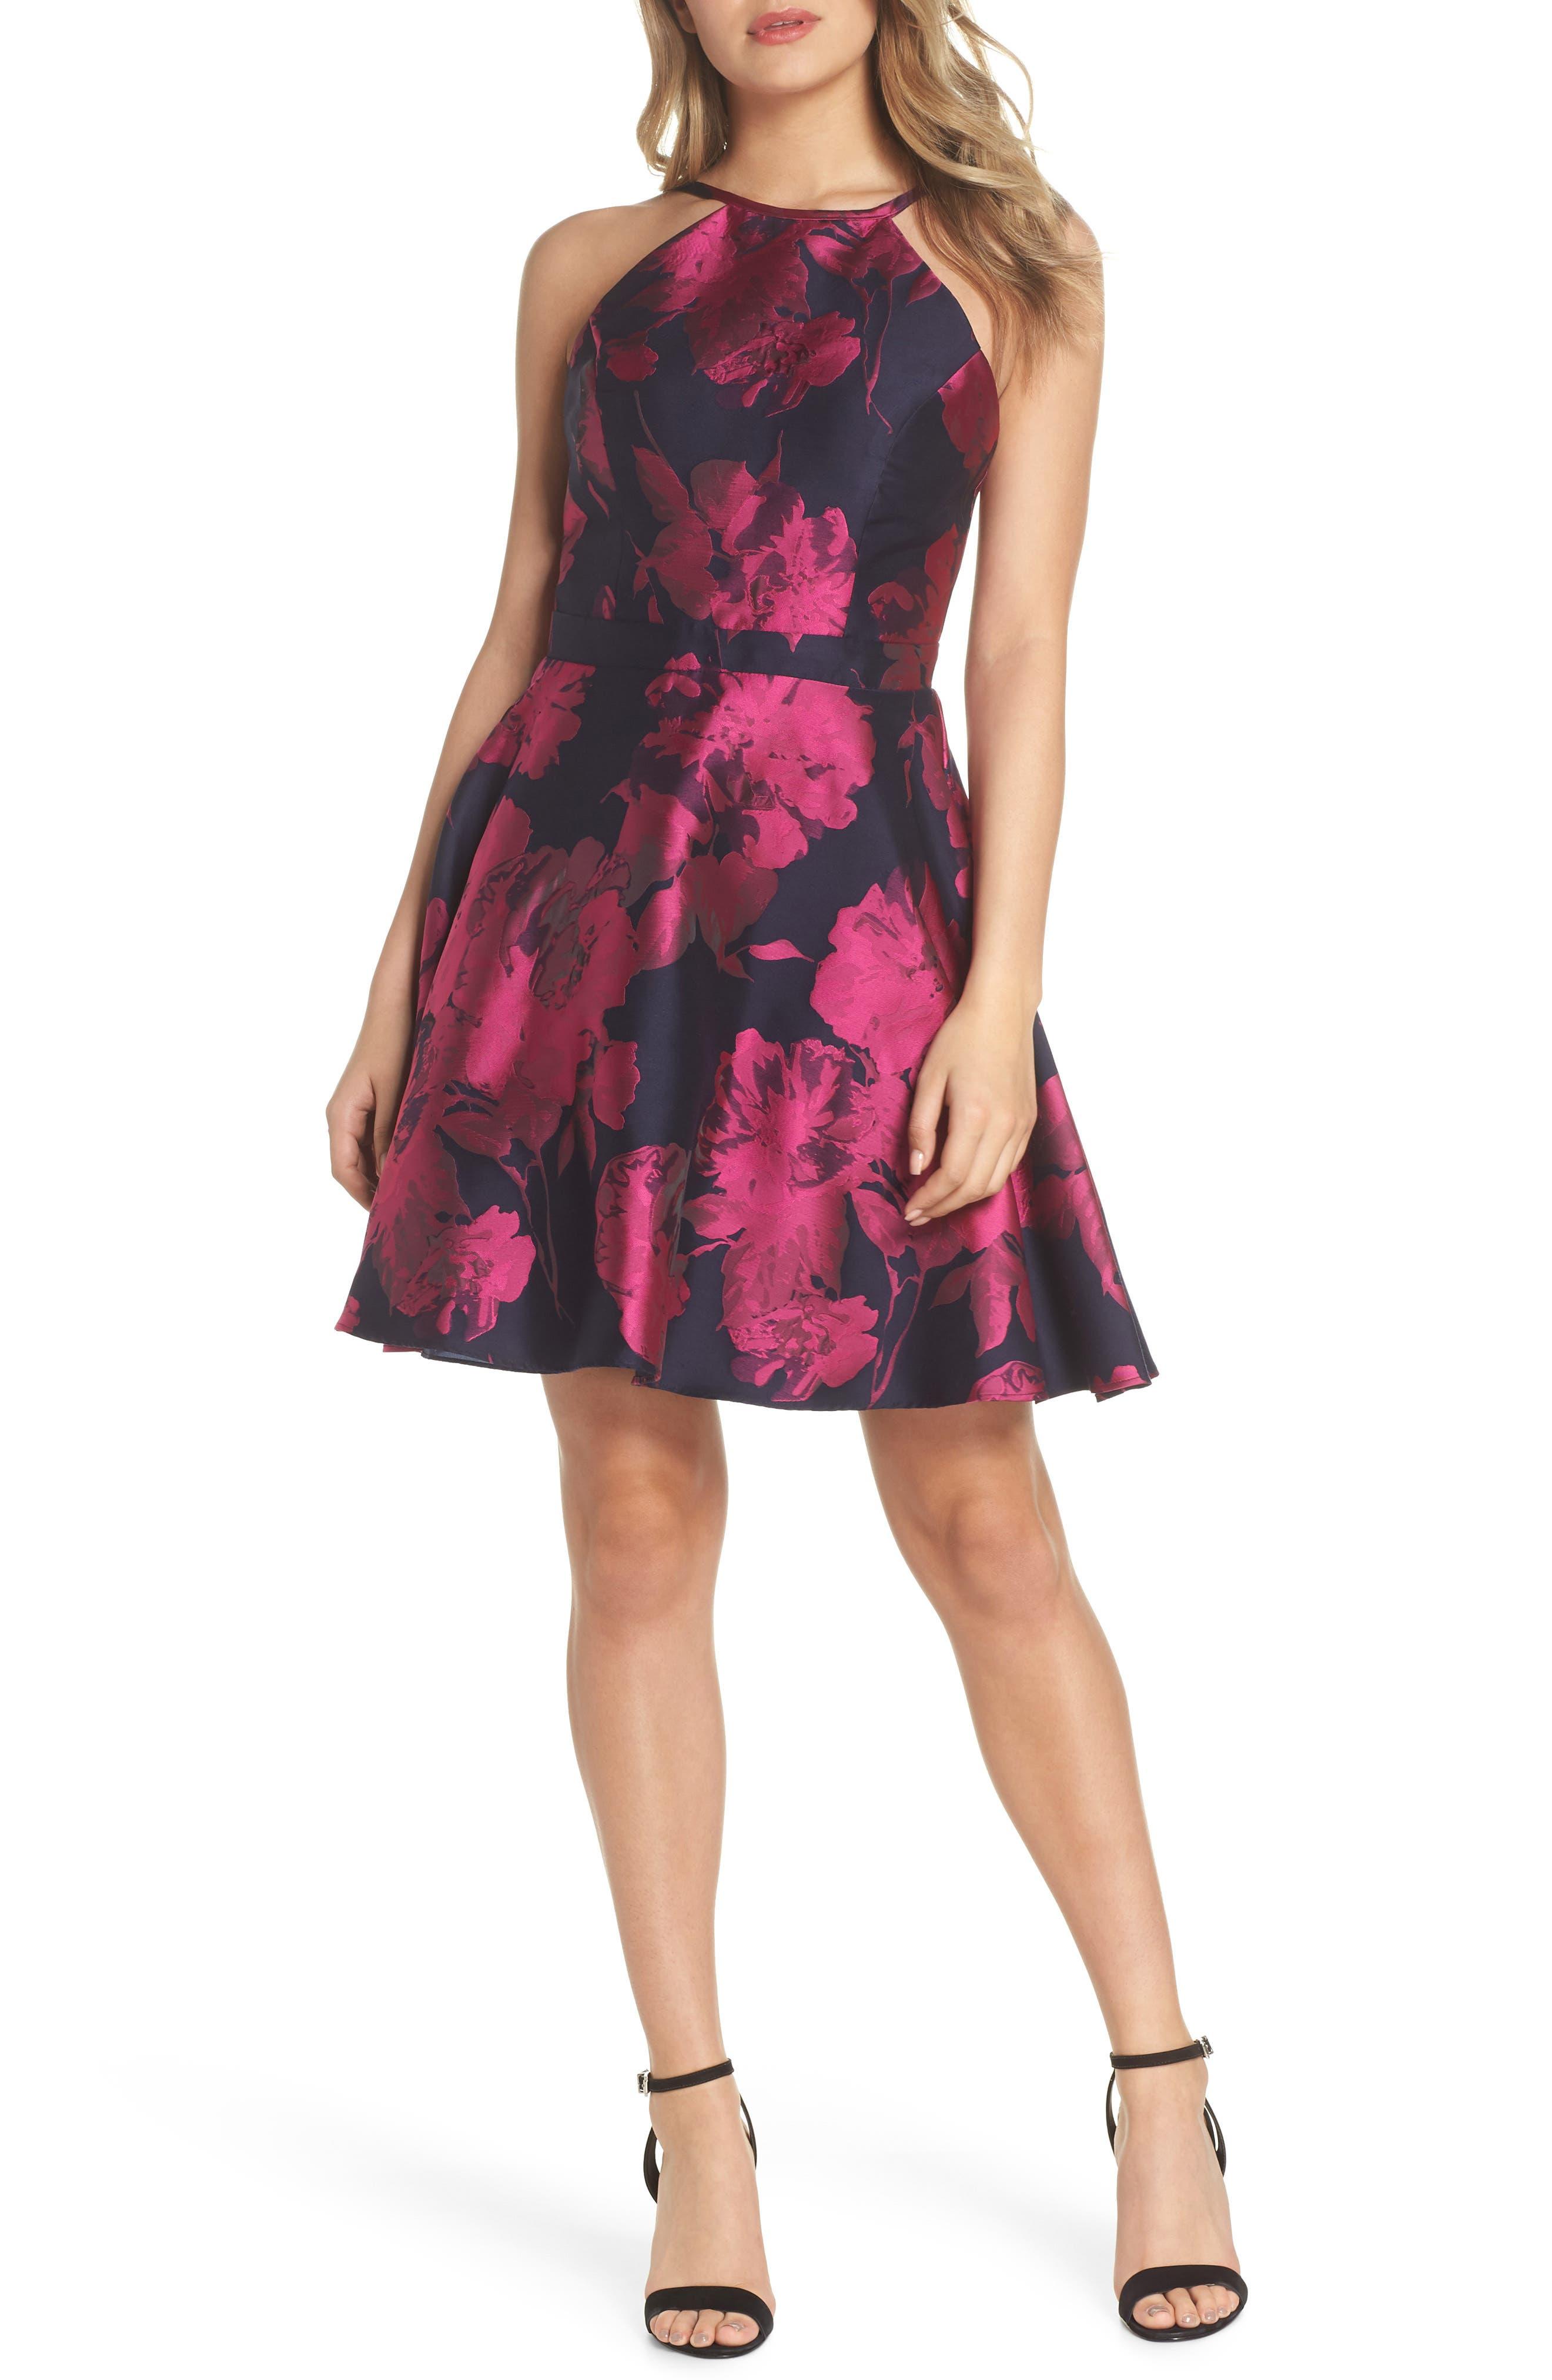 Xscape Floral Brocade Fit & Flare Dress